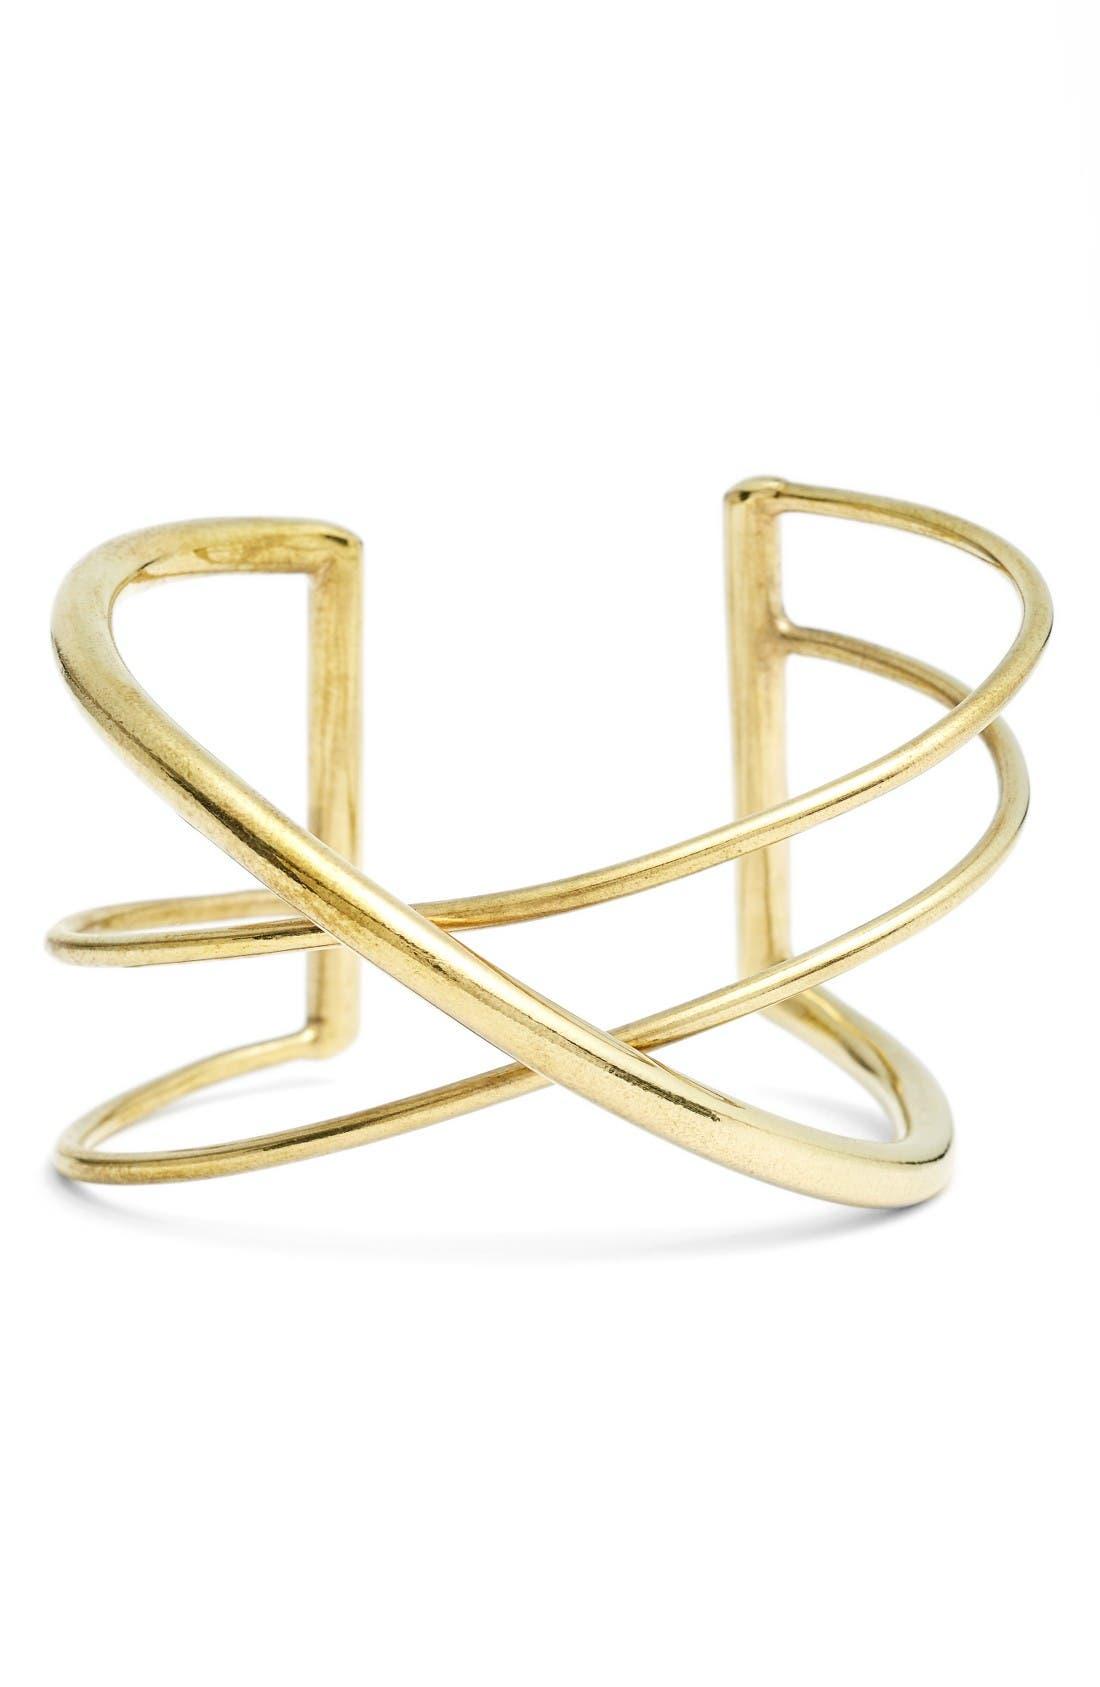 Main Image - Soko Double Cross Cuff